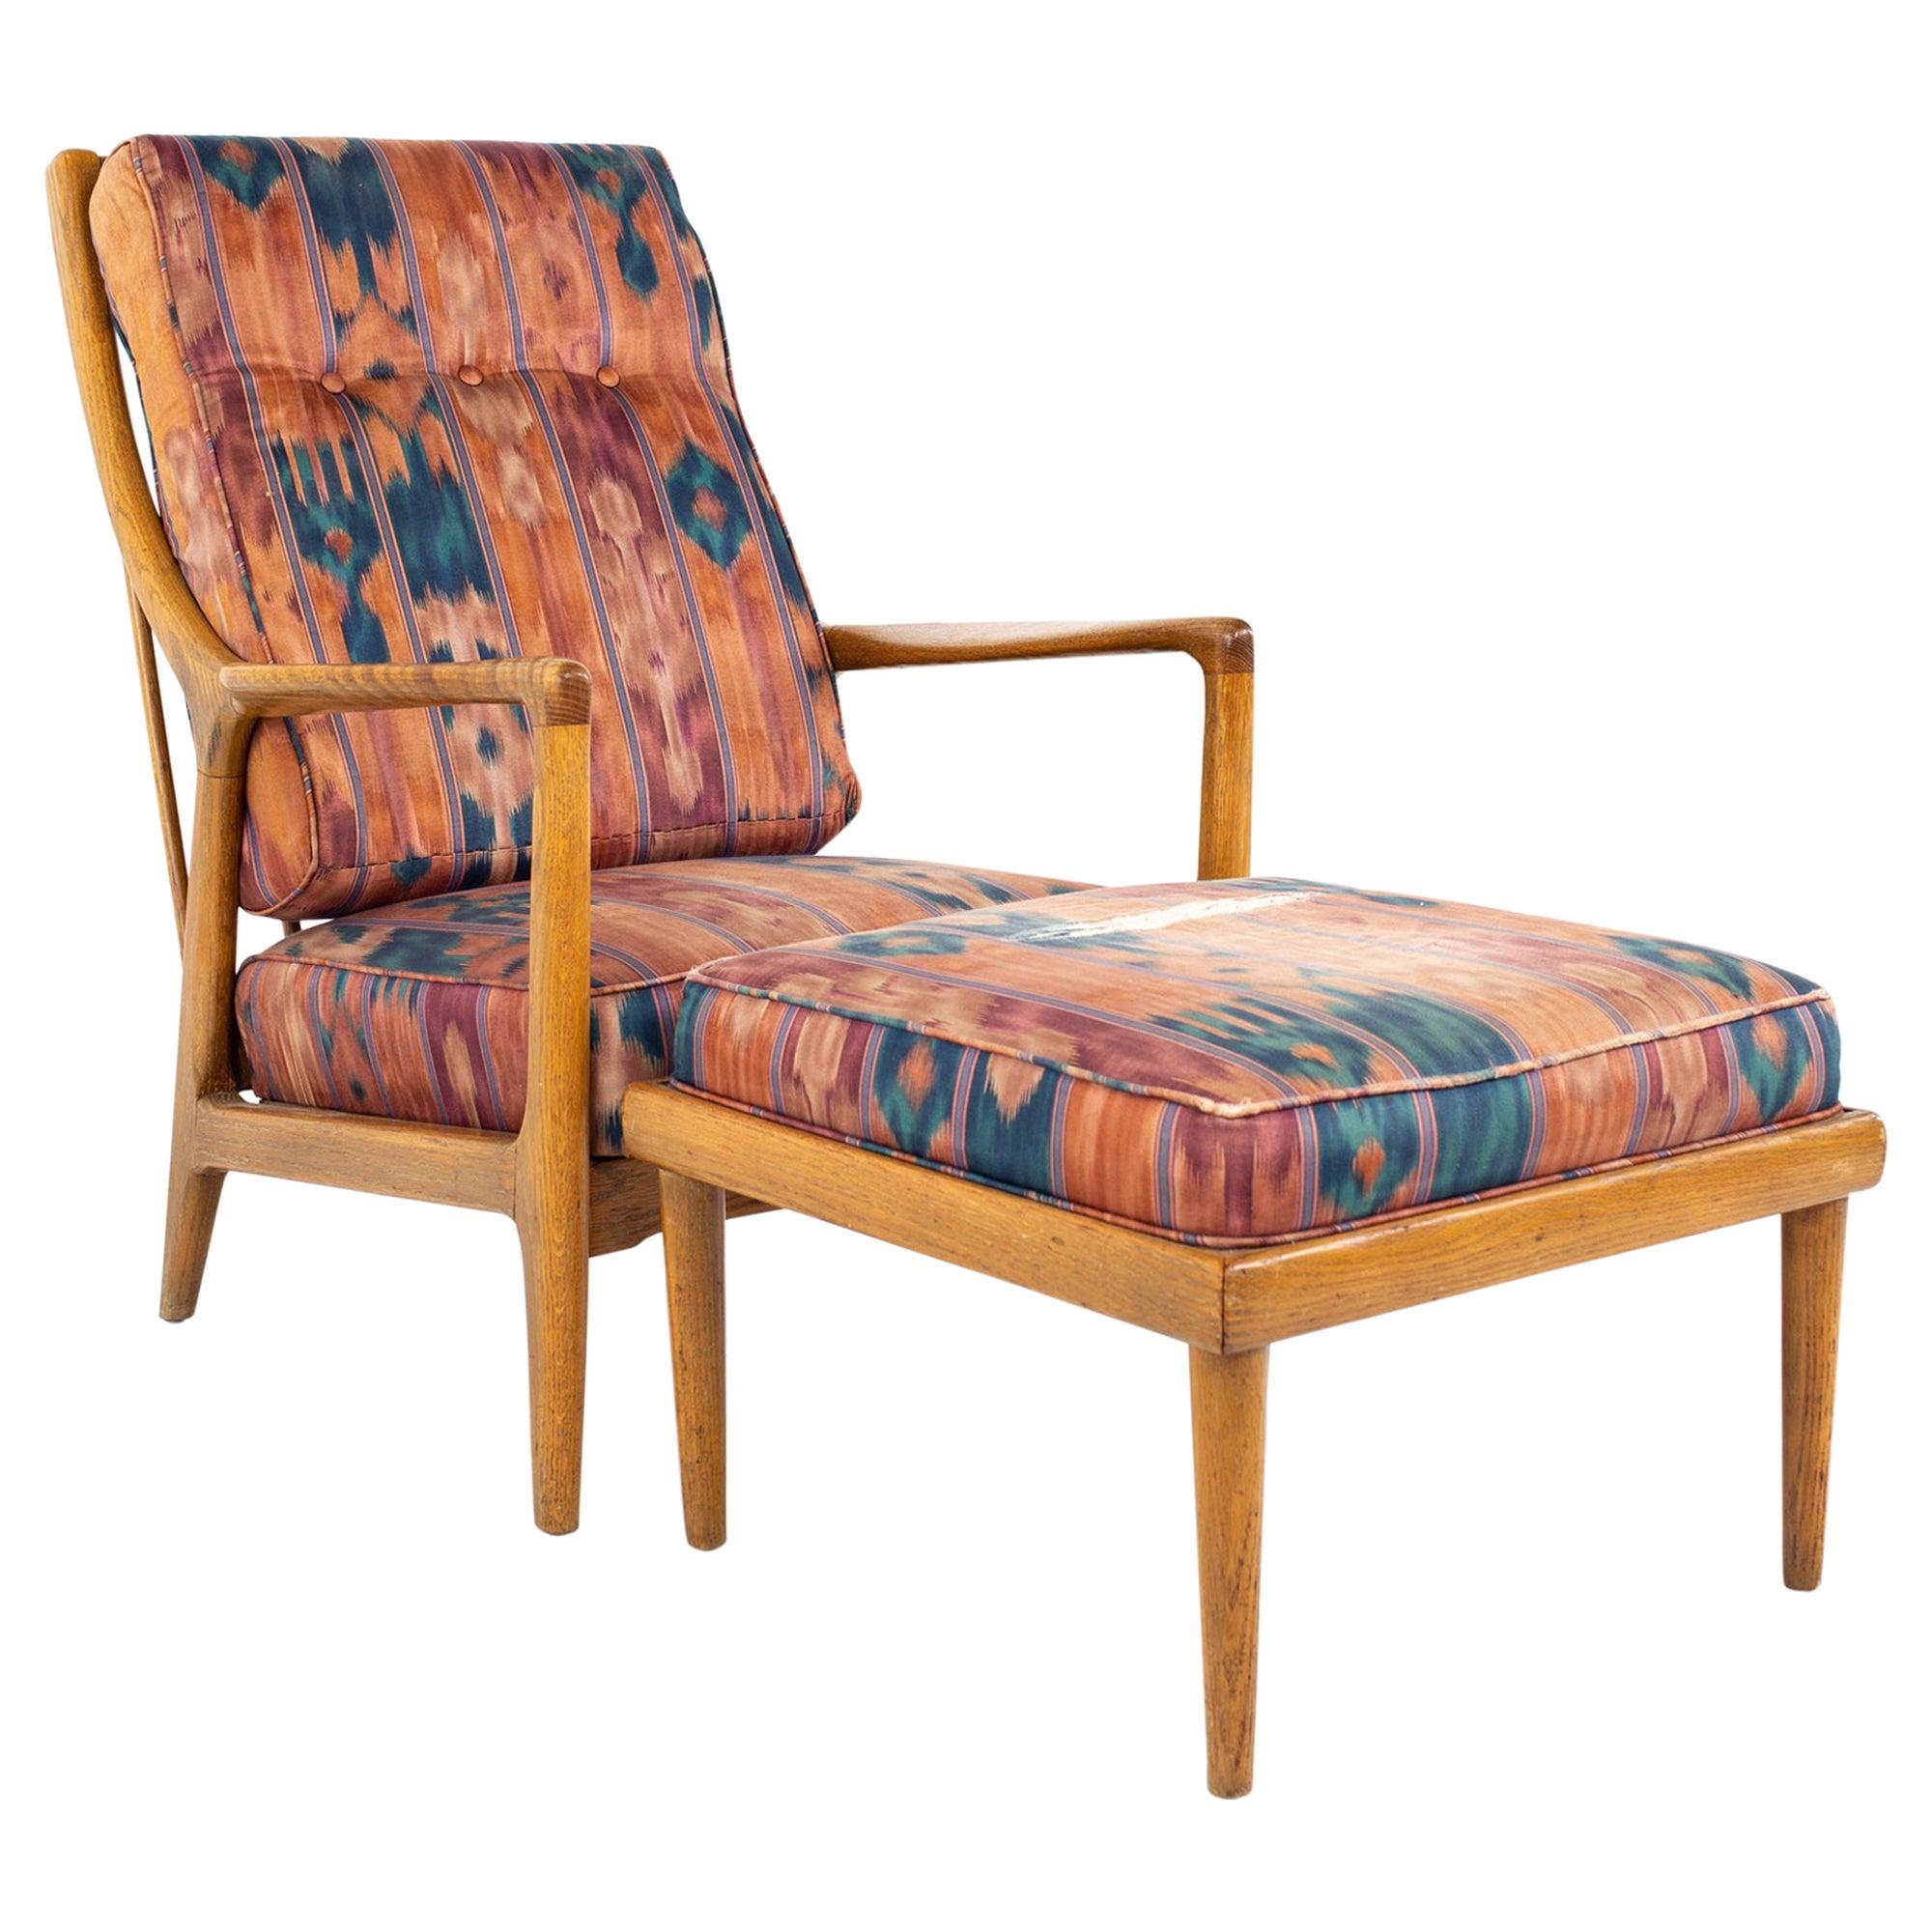 Jack Van der Molen Mid Century Blonde Oak Lounge Chair and Ottoman